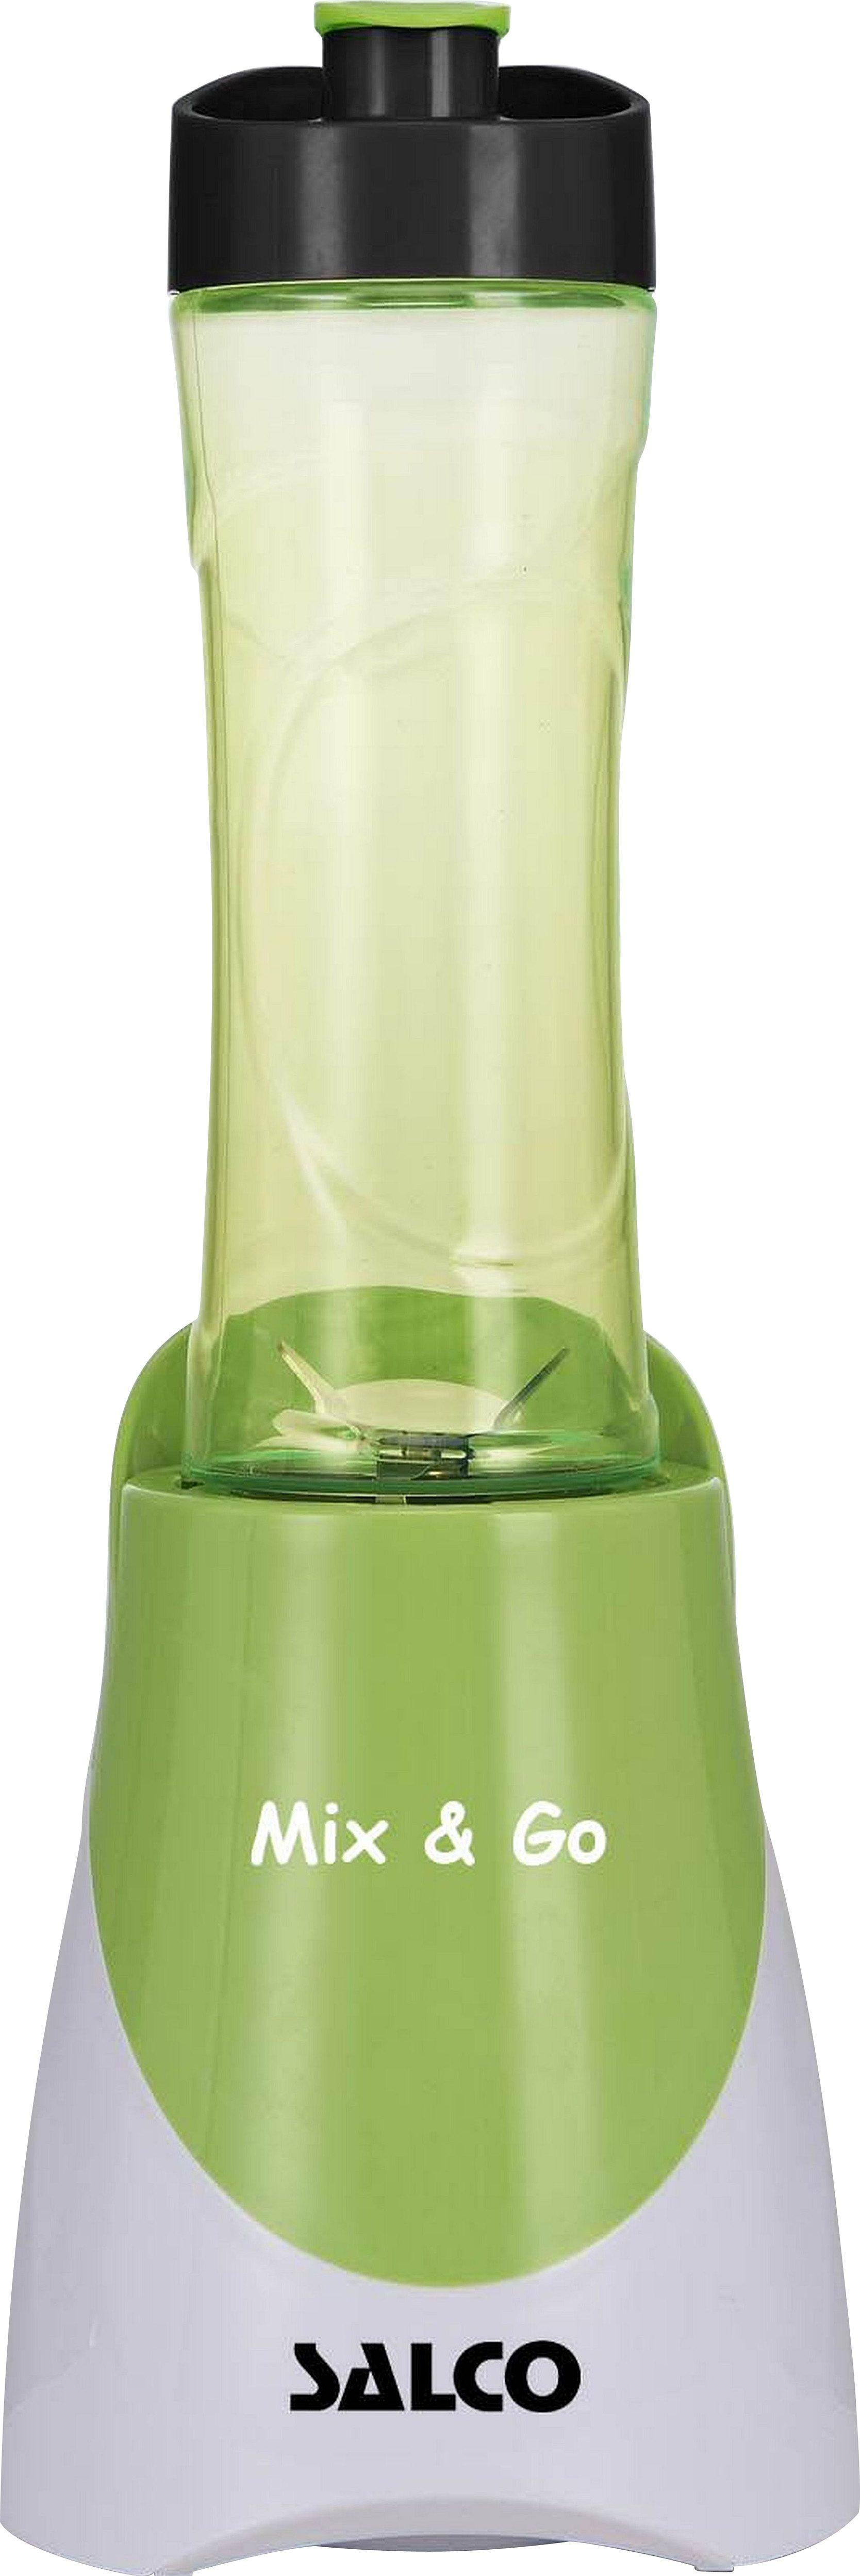 Salco Smoothie-Mixer SM-14 »MIX&GO«, 300 Watt, weiß-grün